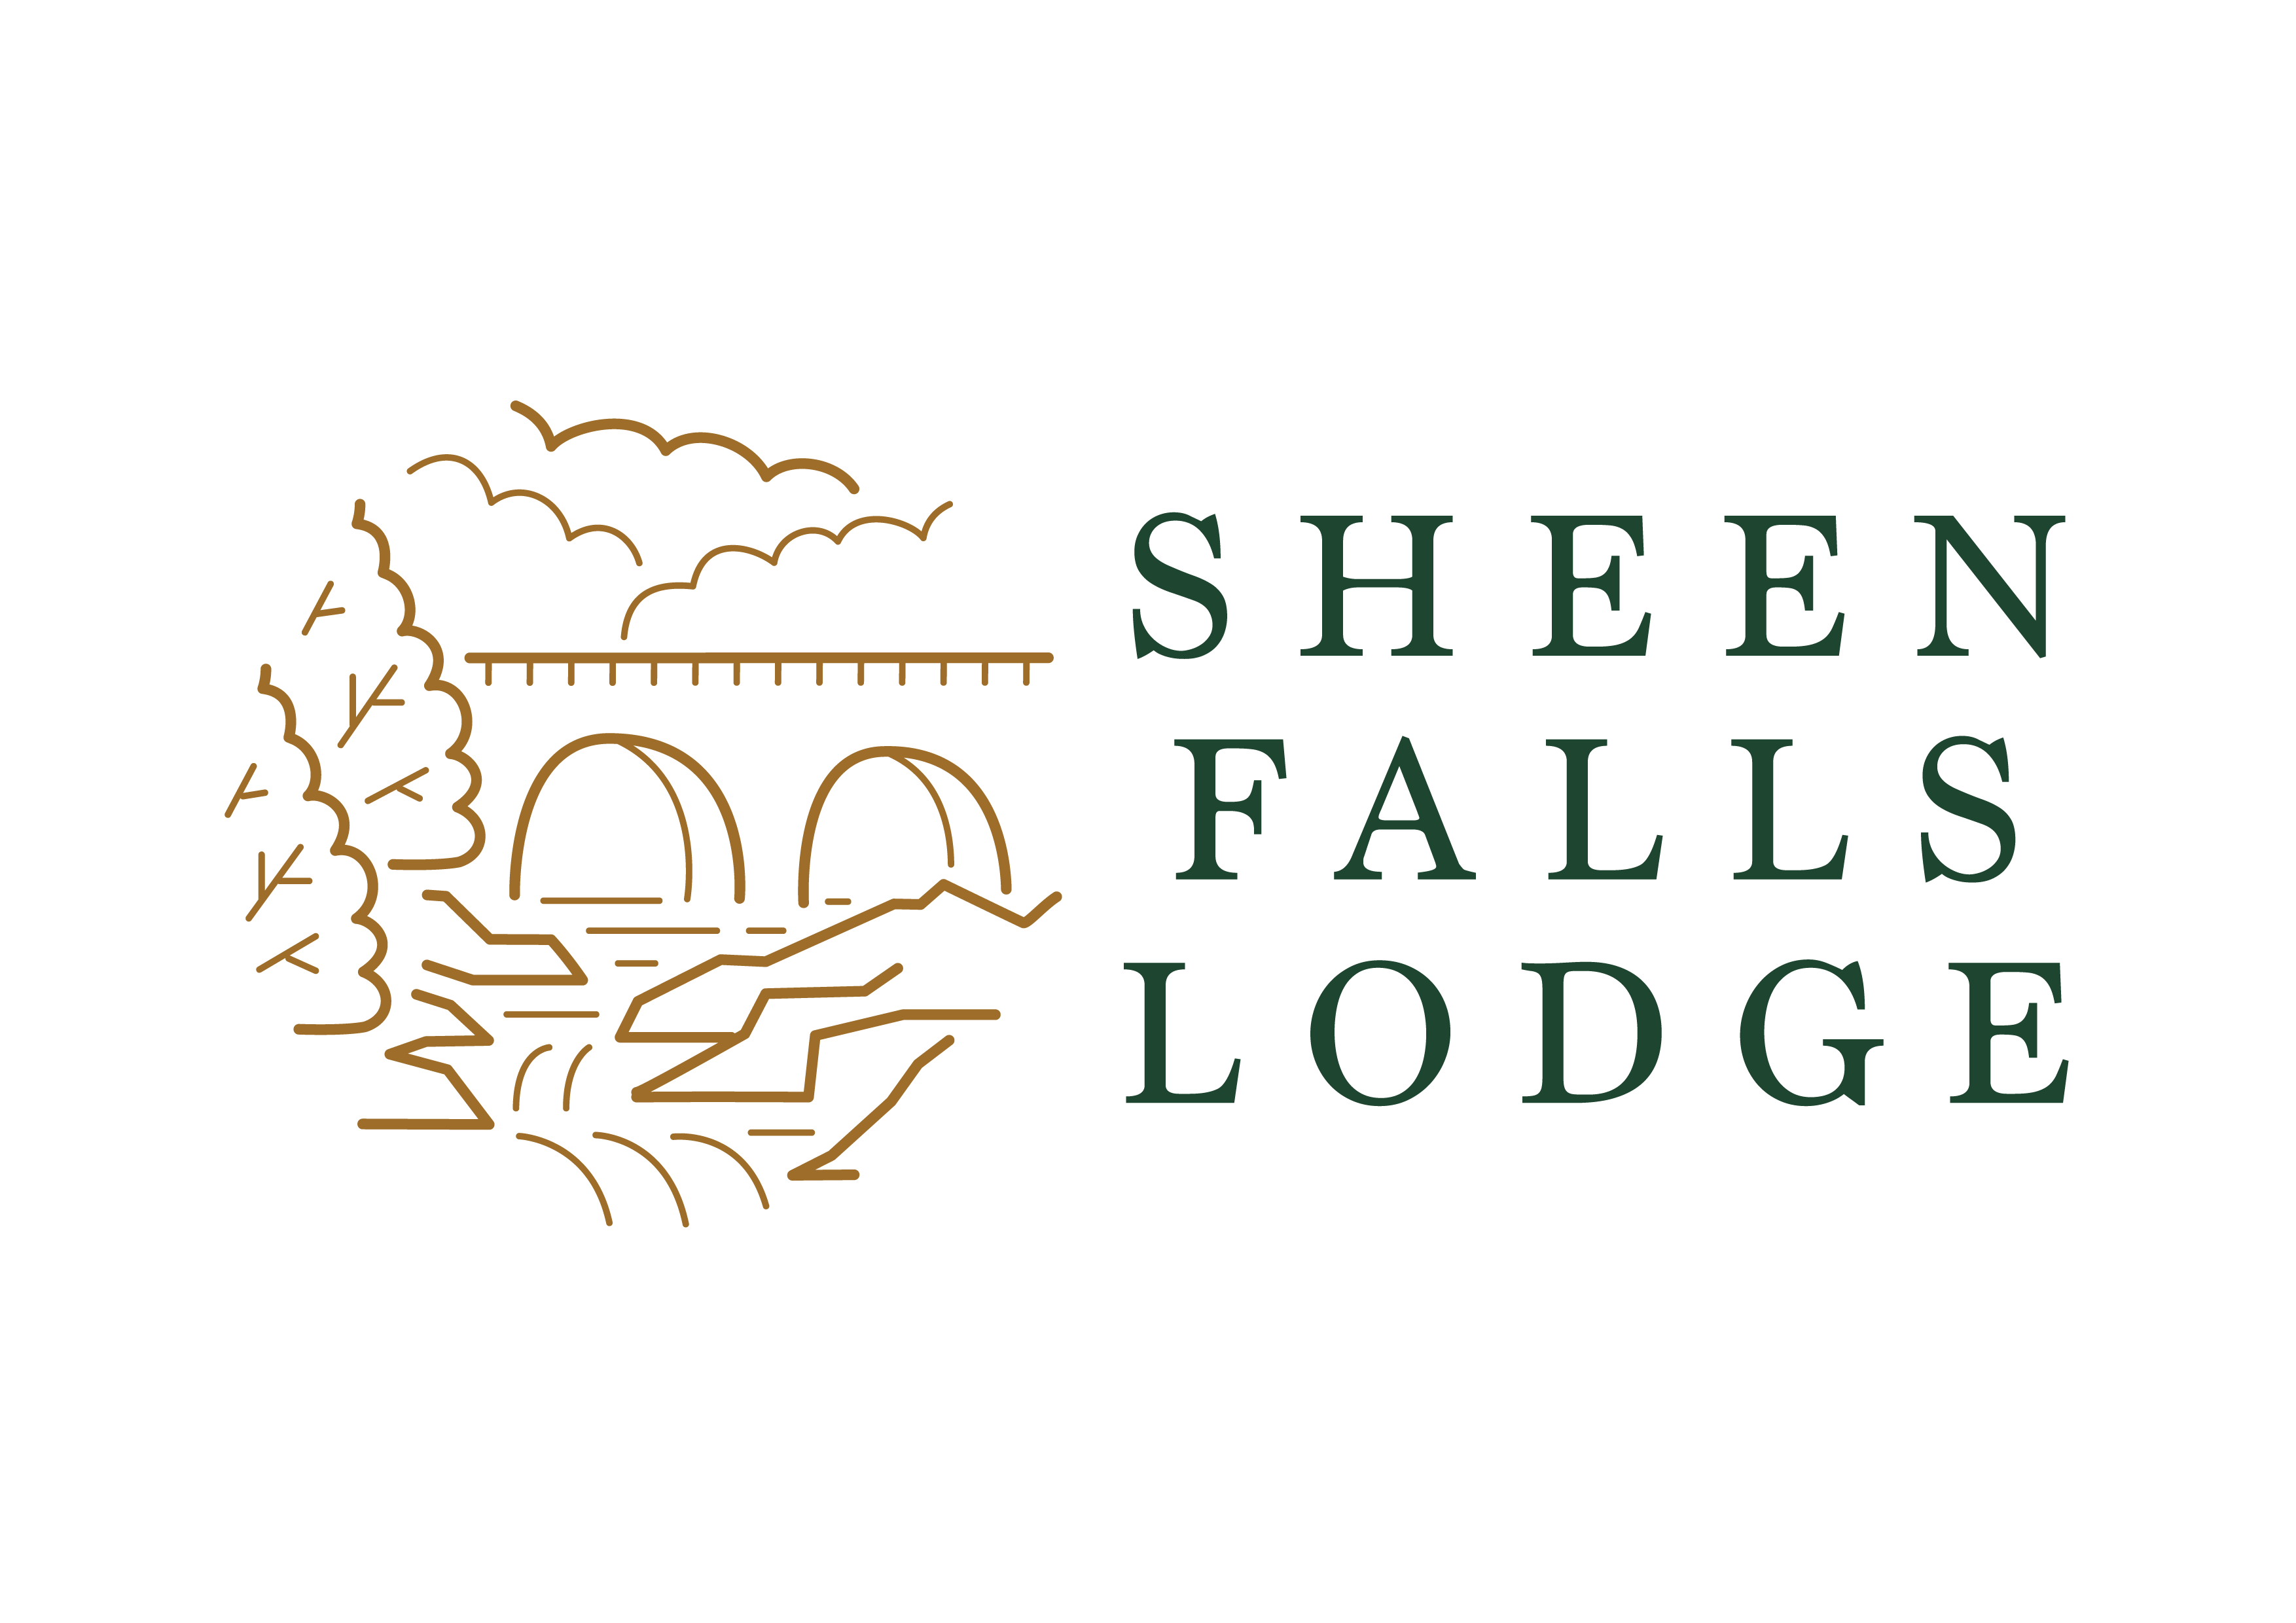 Sheen Falls Lodge image